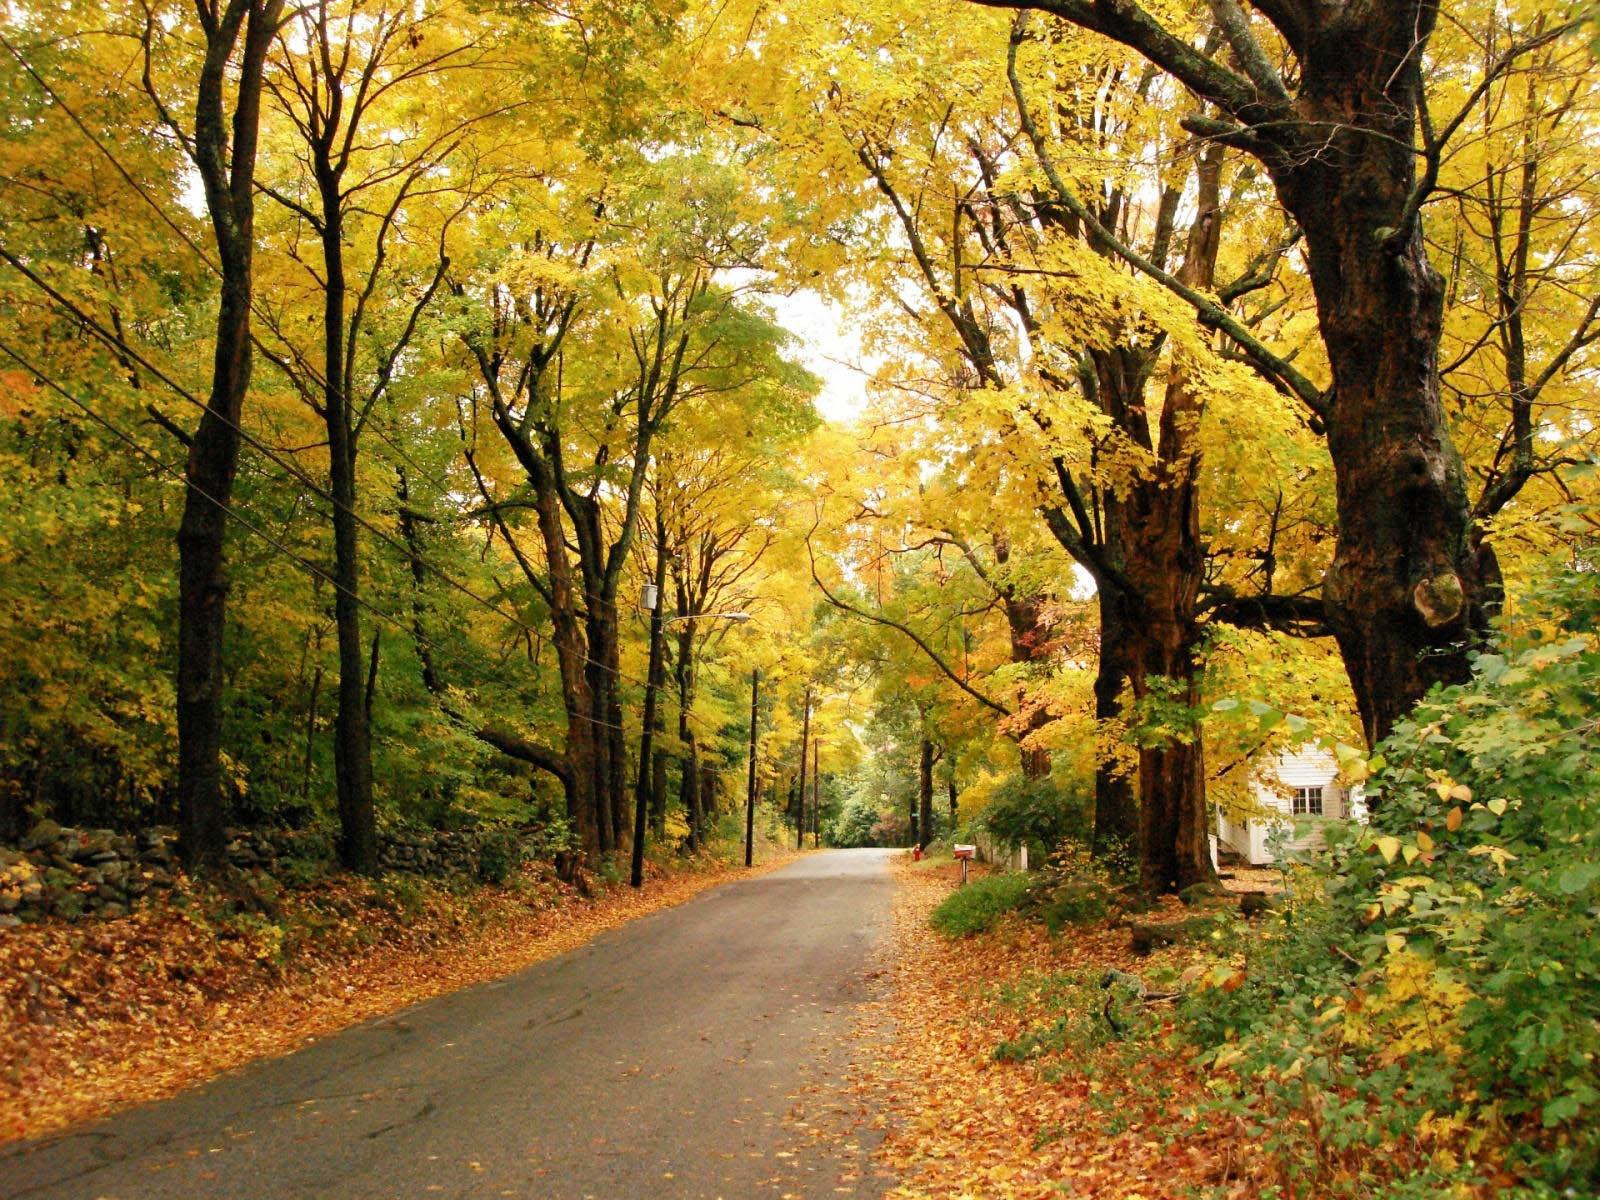 wallpaper: super Autumn Scenery Wallpapers